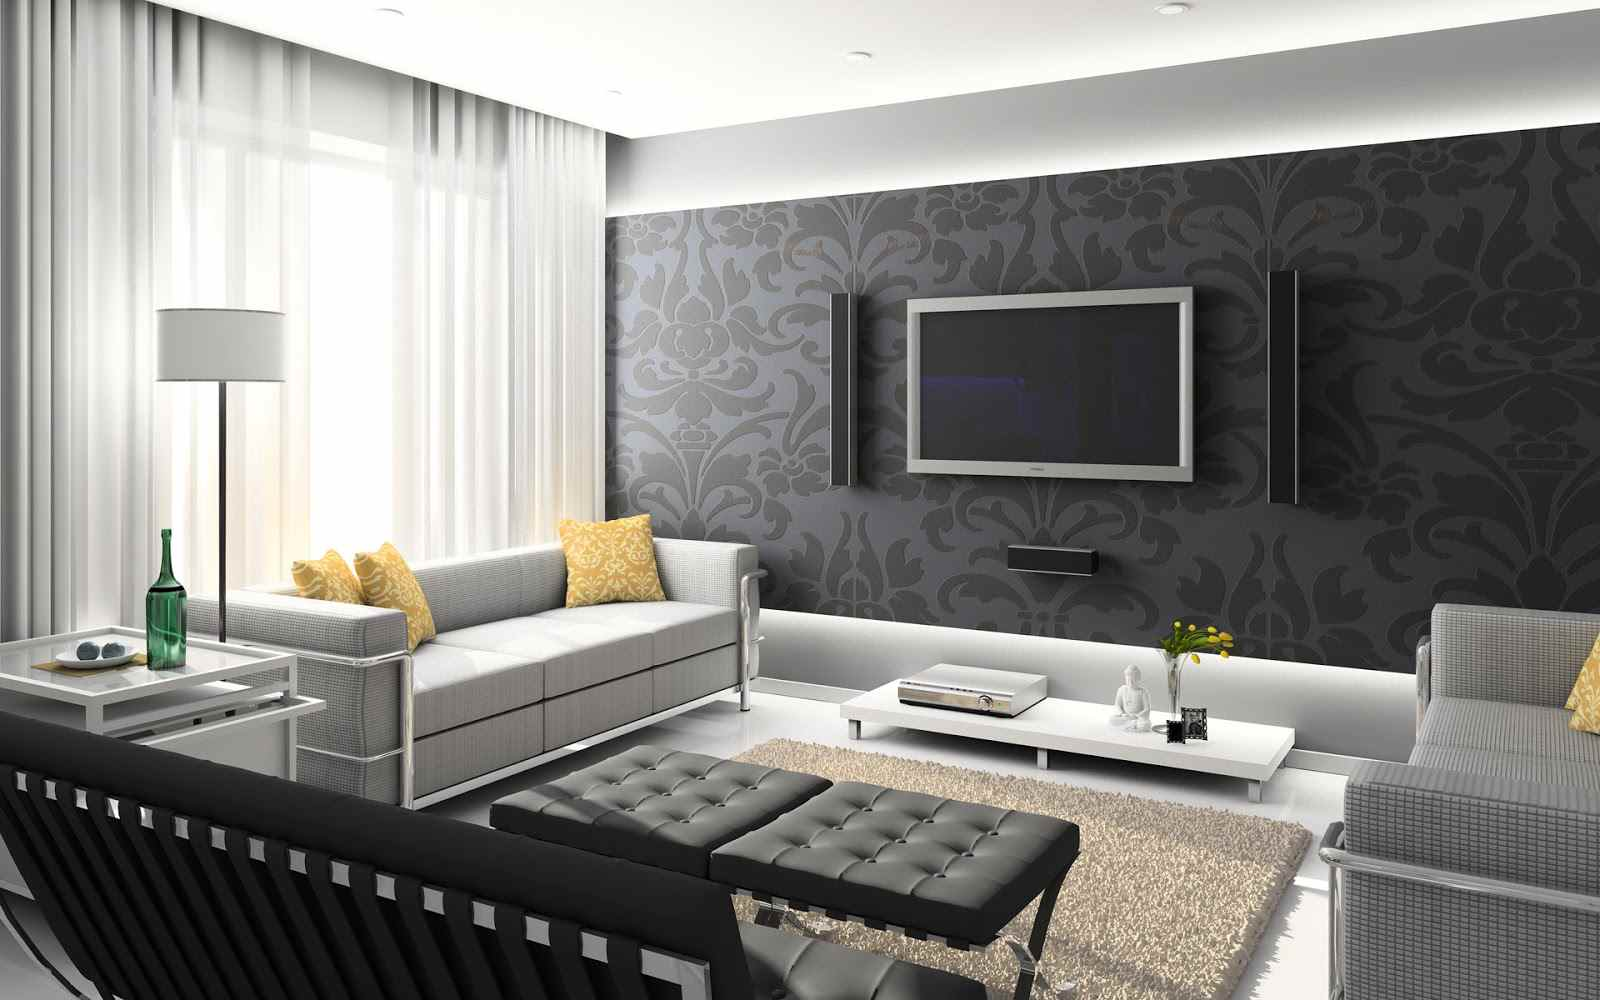 home wallpaper designs. wallpaper home design 3d home design white